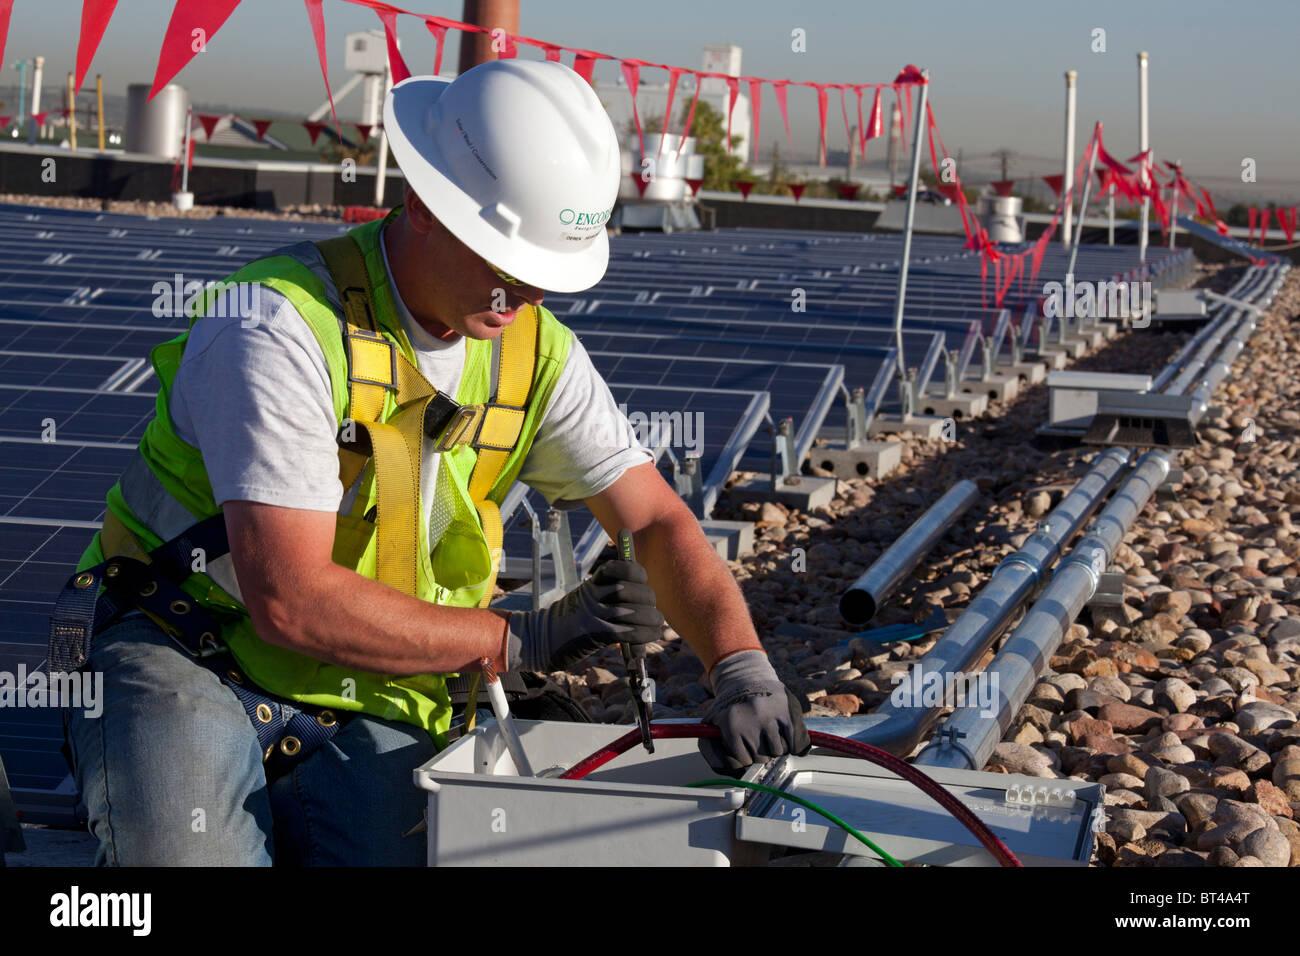 Photovoltaic Panel Wiring Diagram System Denver Colorado Workers Install For Solar Rh Alamy Com Works